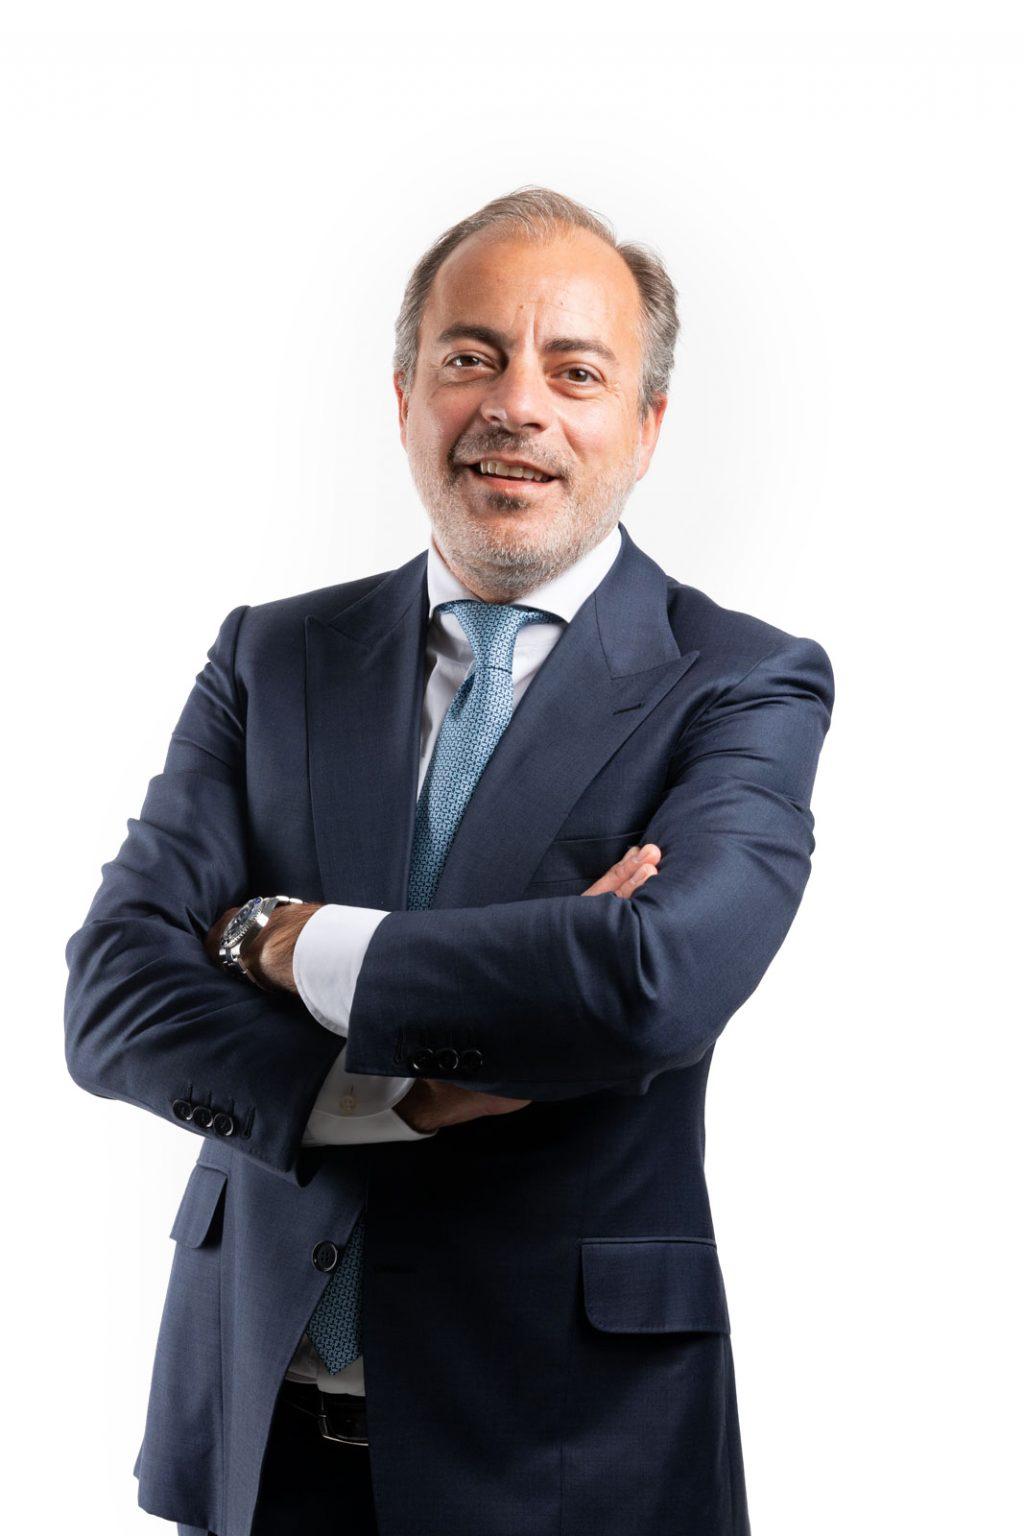 João Miguel Matos